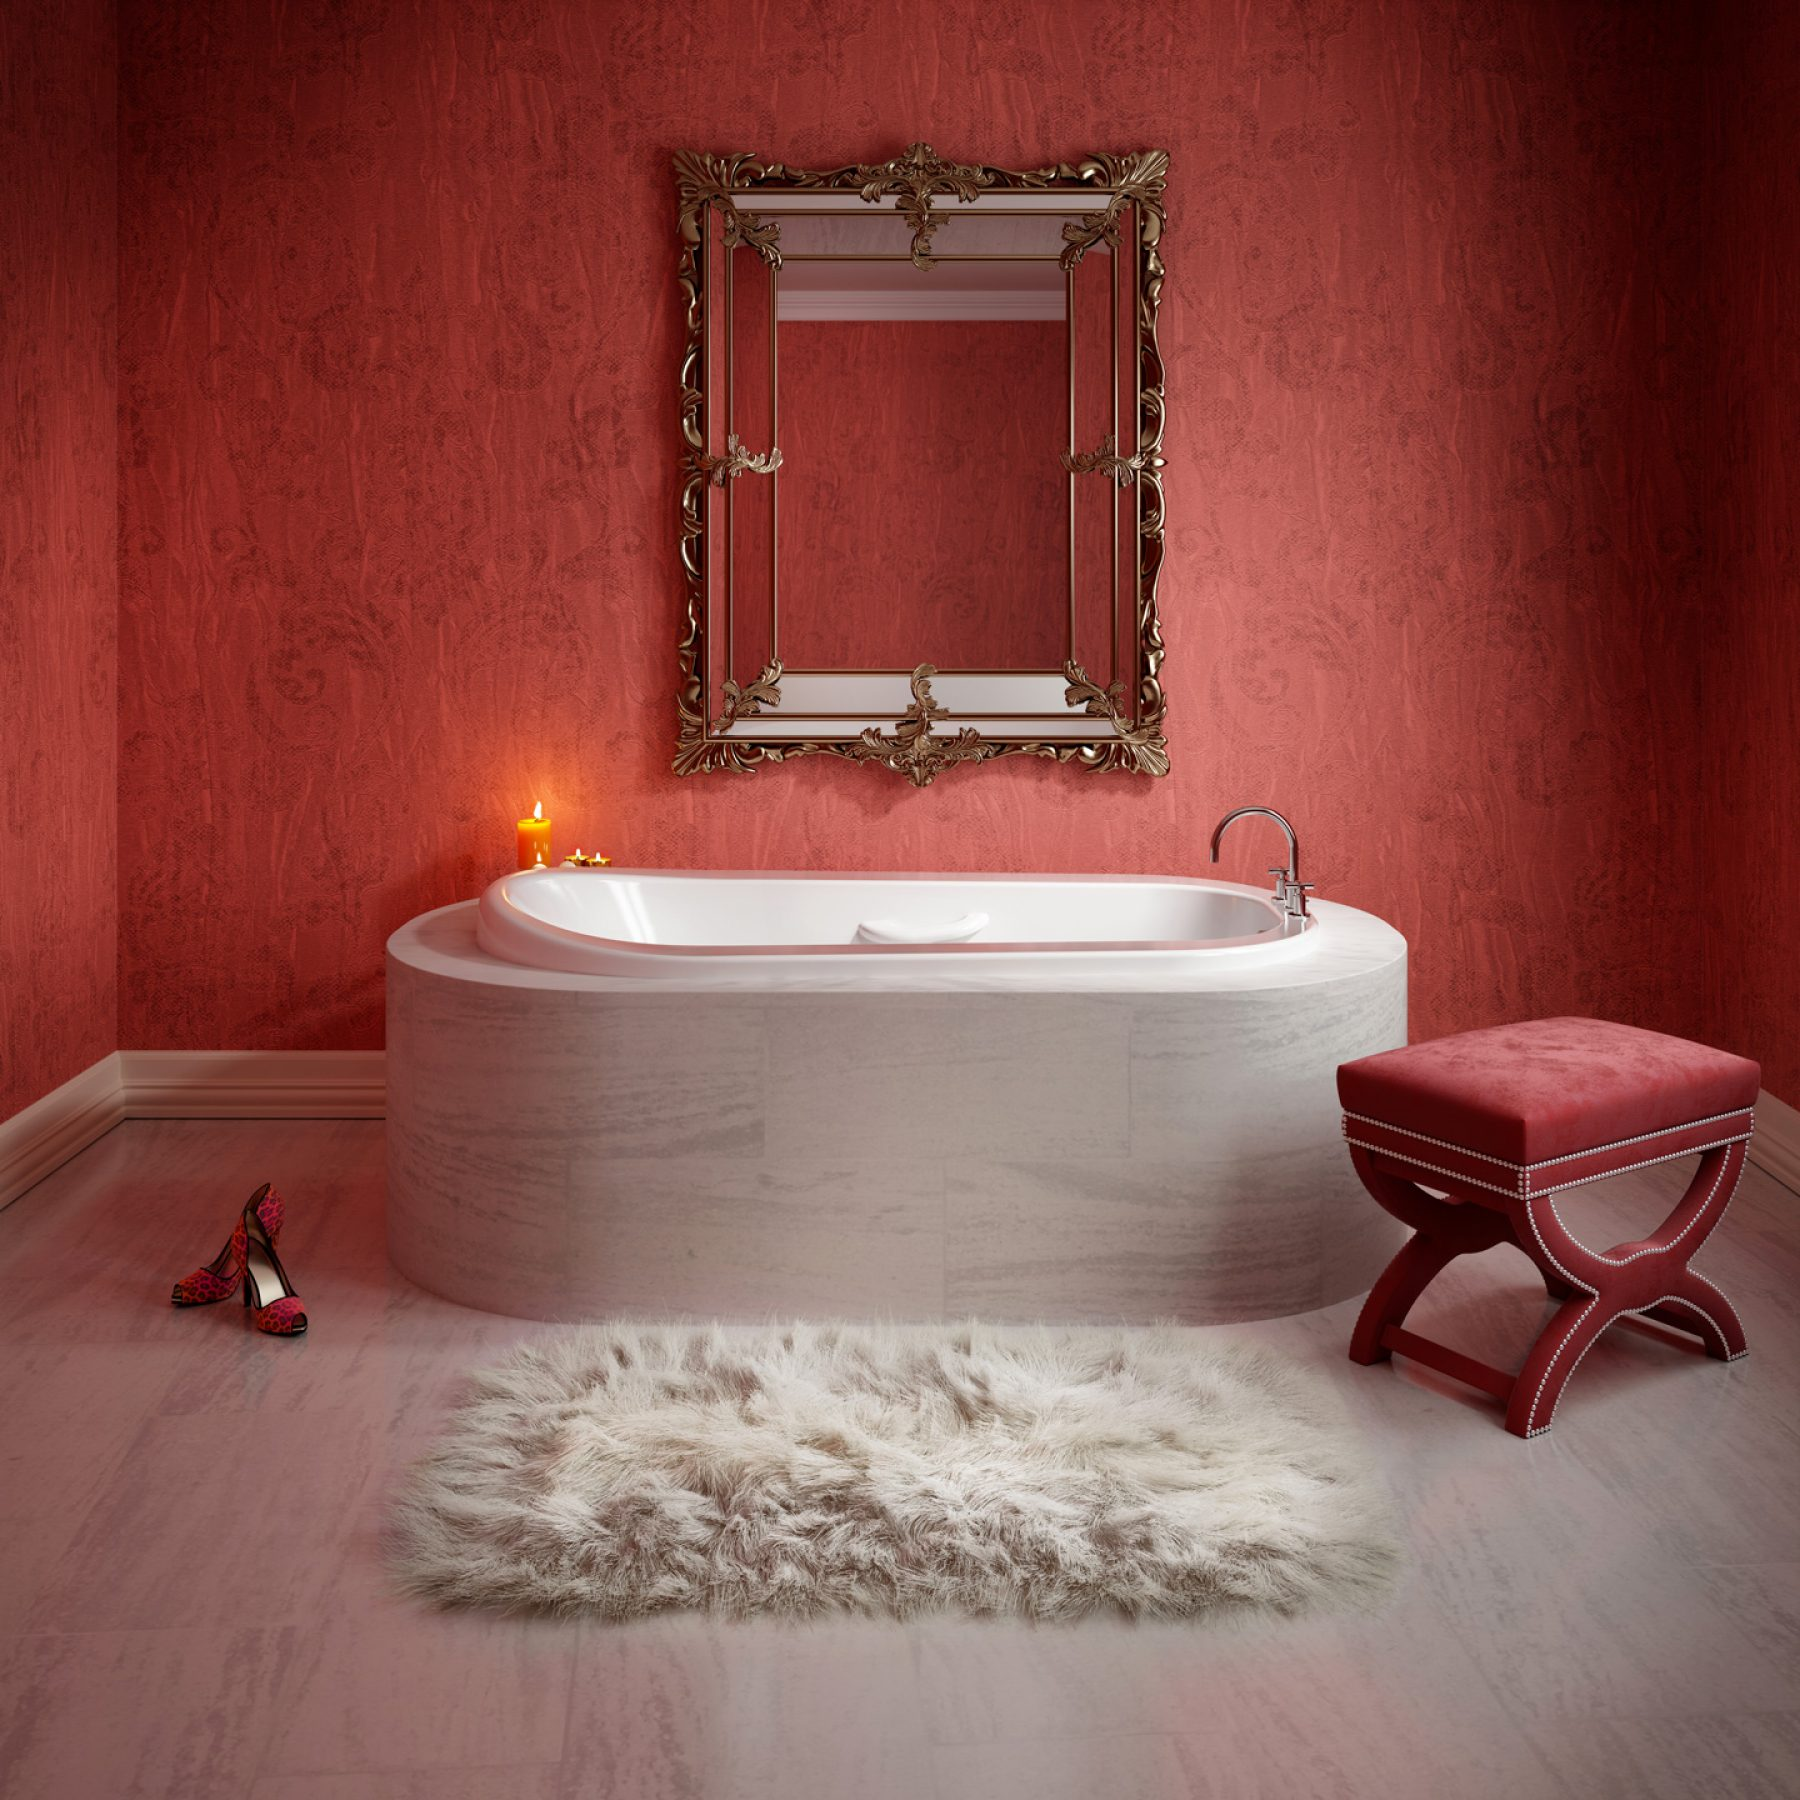 dessin-photorealiste-rouge-salle-de-bain